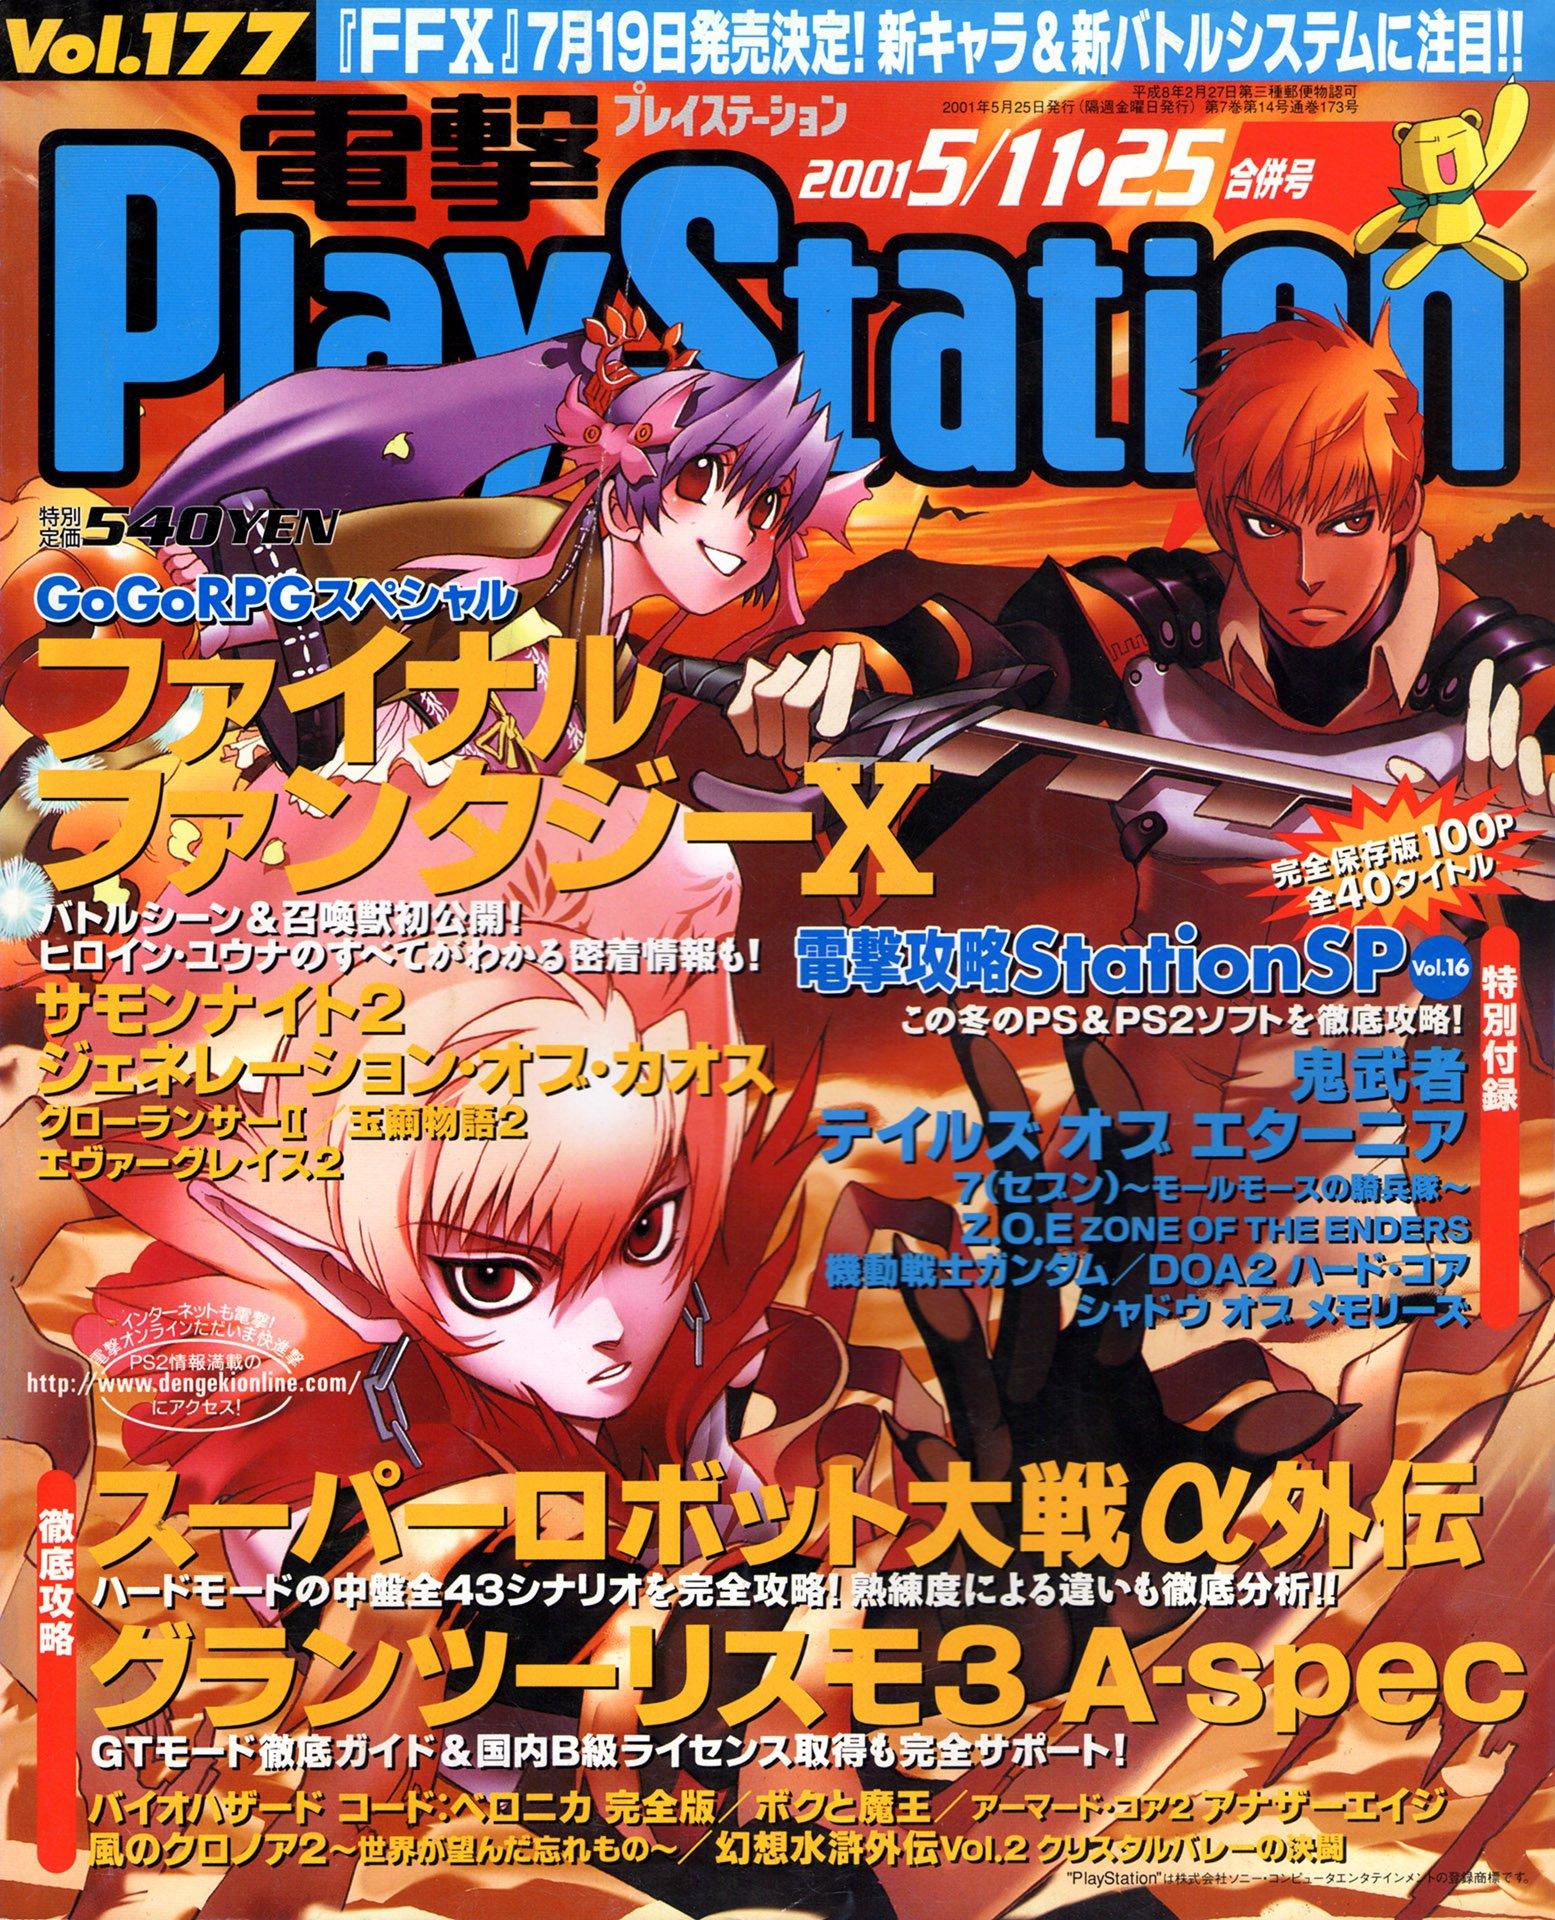 Dengeki PlayStation 177 (May 11/25, 2001)